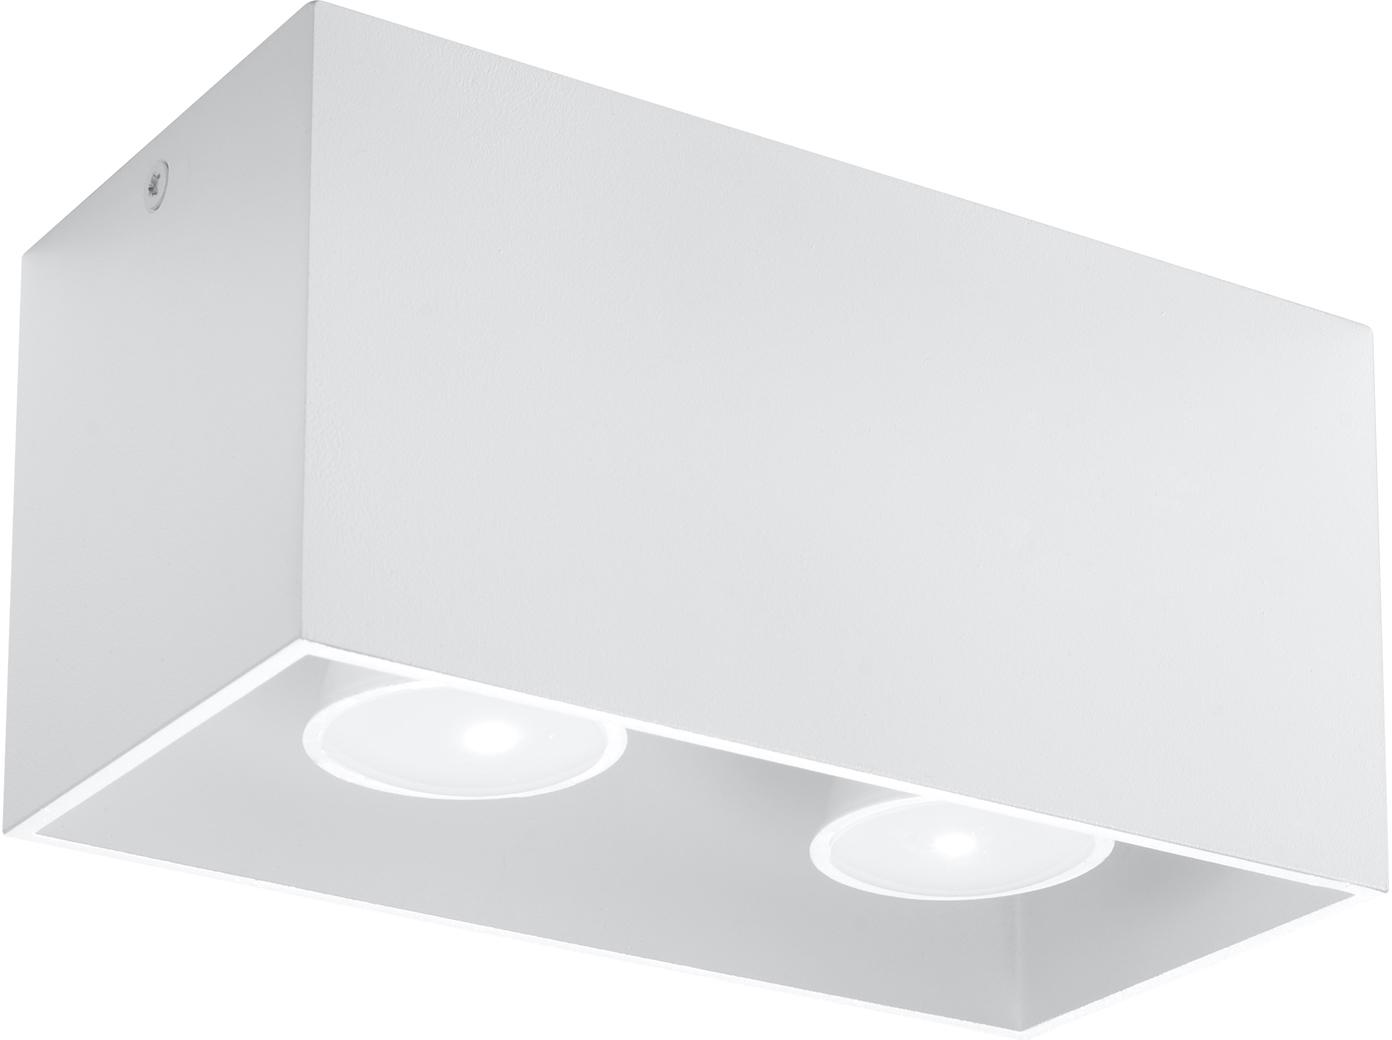 Plafondlamp Geo, Aluminium, Wit, 20 x 10 cm